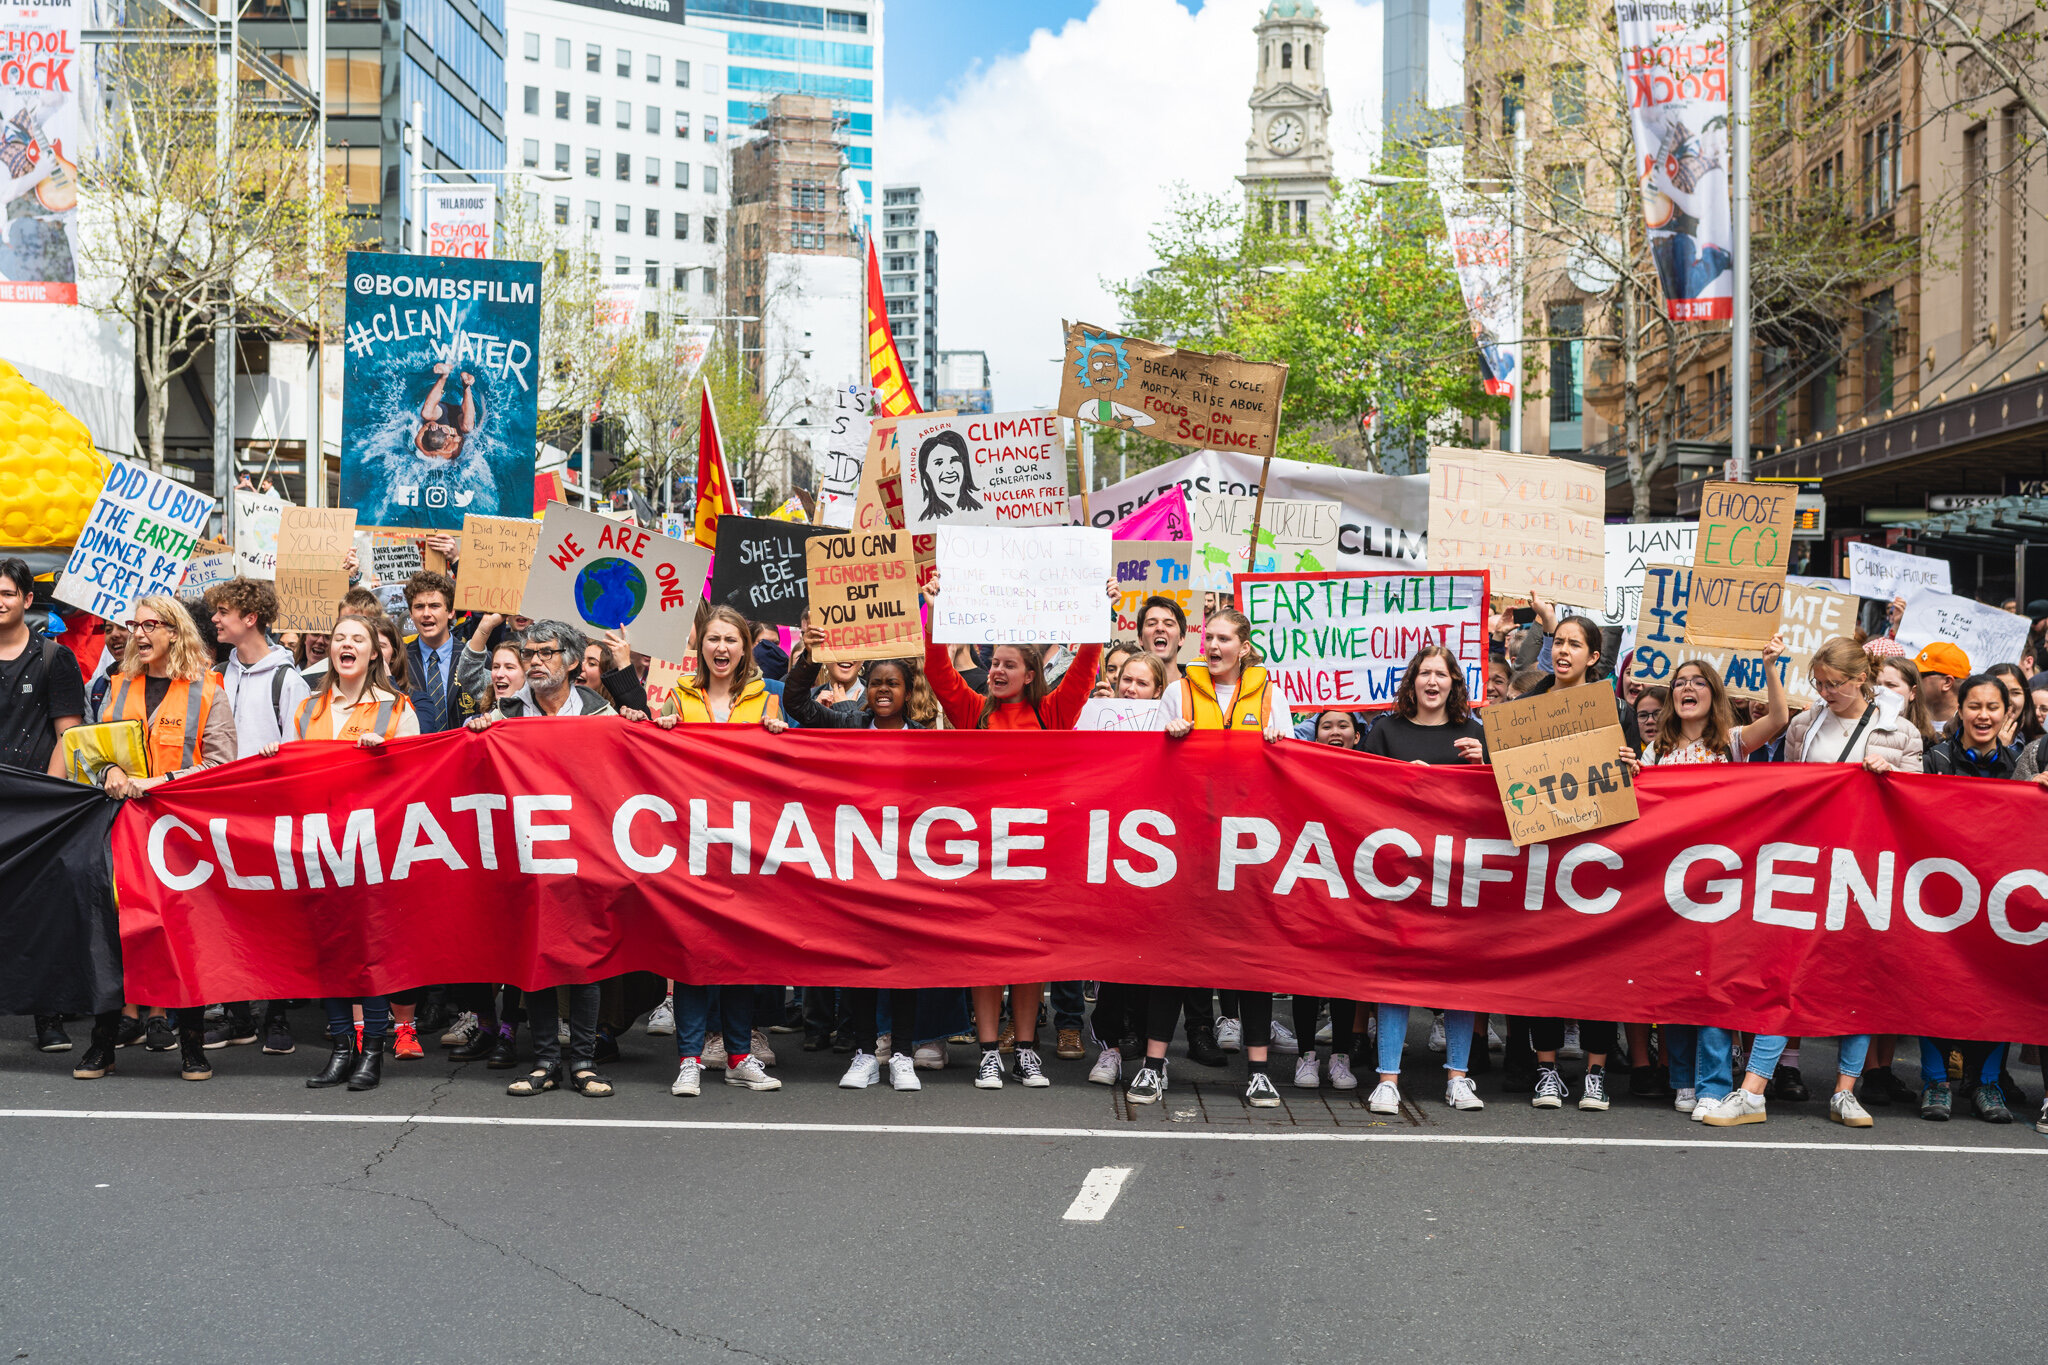 2019 09 27 Climate Demo-153.jpg